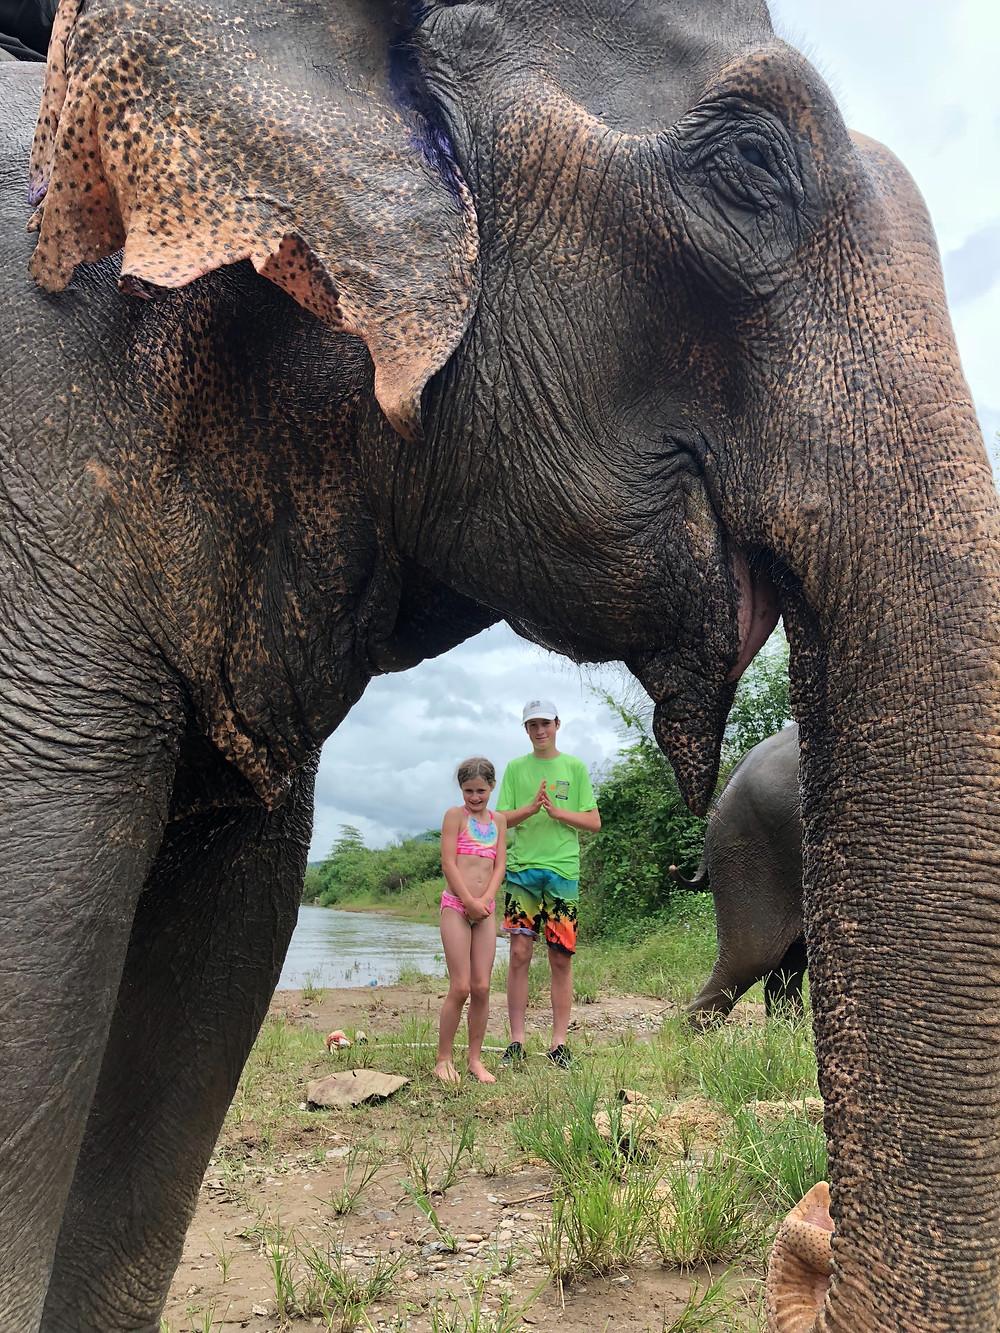 Elephant Village Sanctuary, Luang Prabang, Laos